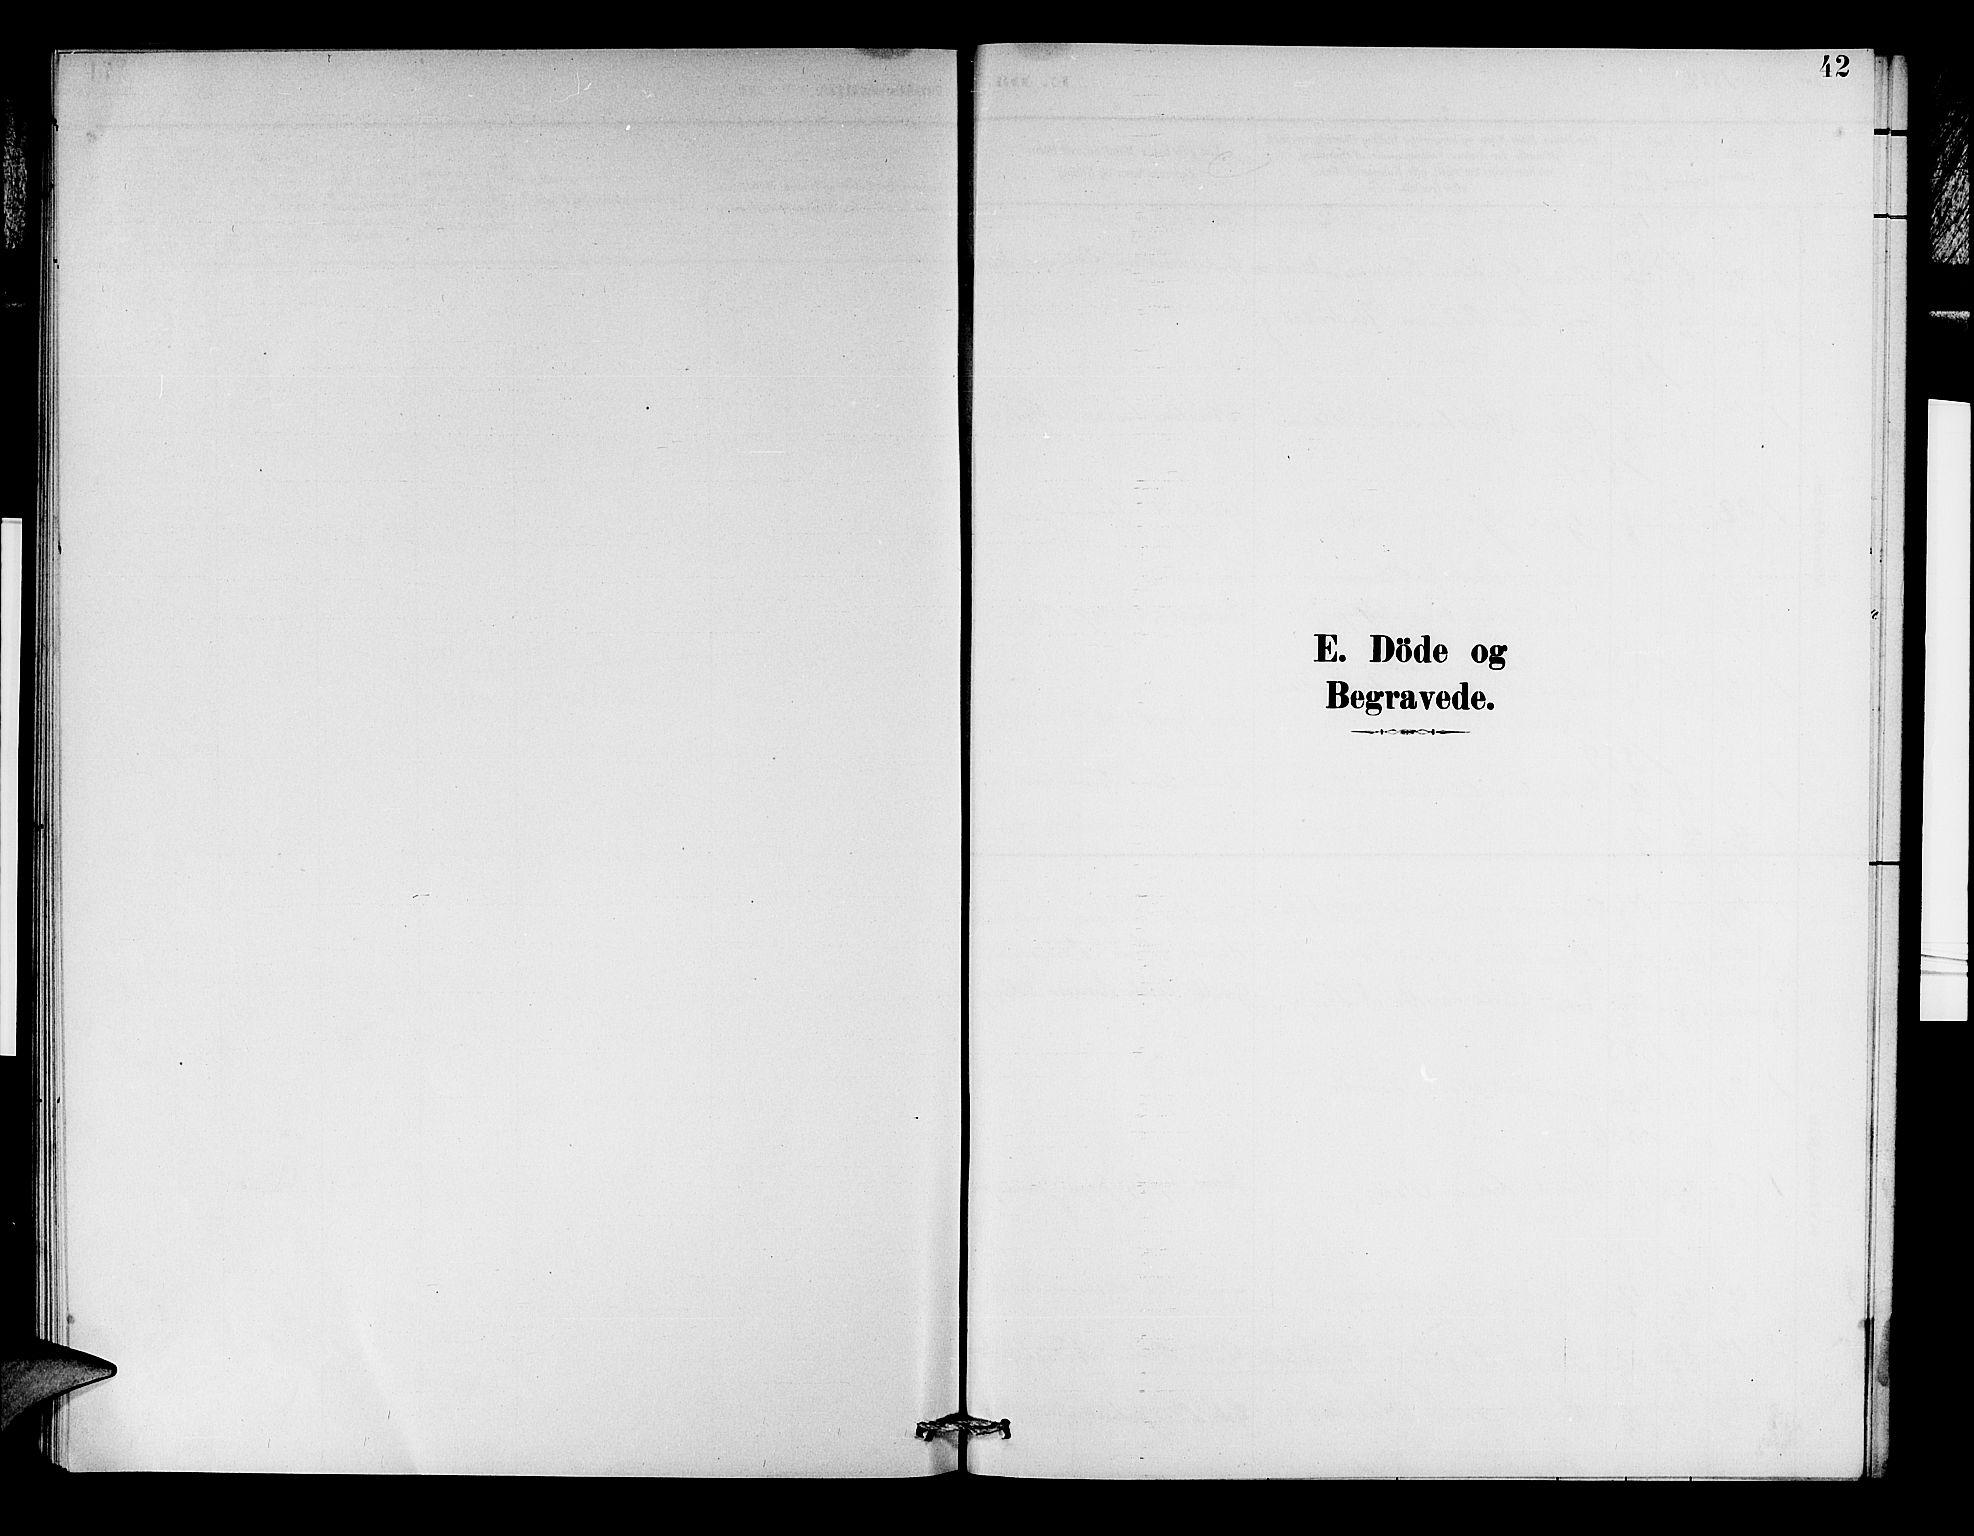 SAB, Aurland Sokneprestembete*, Klokkerbok nr. D 2, 1883-1920, s. 42